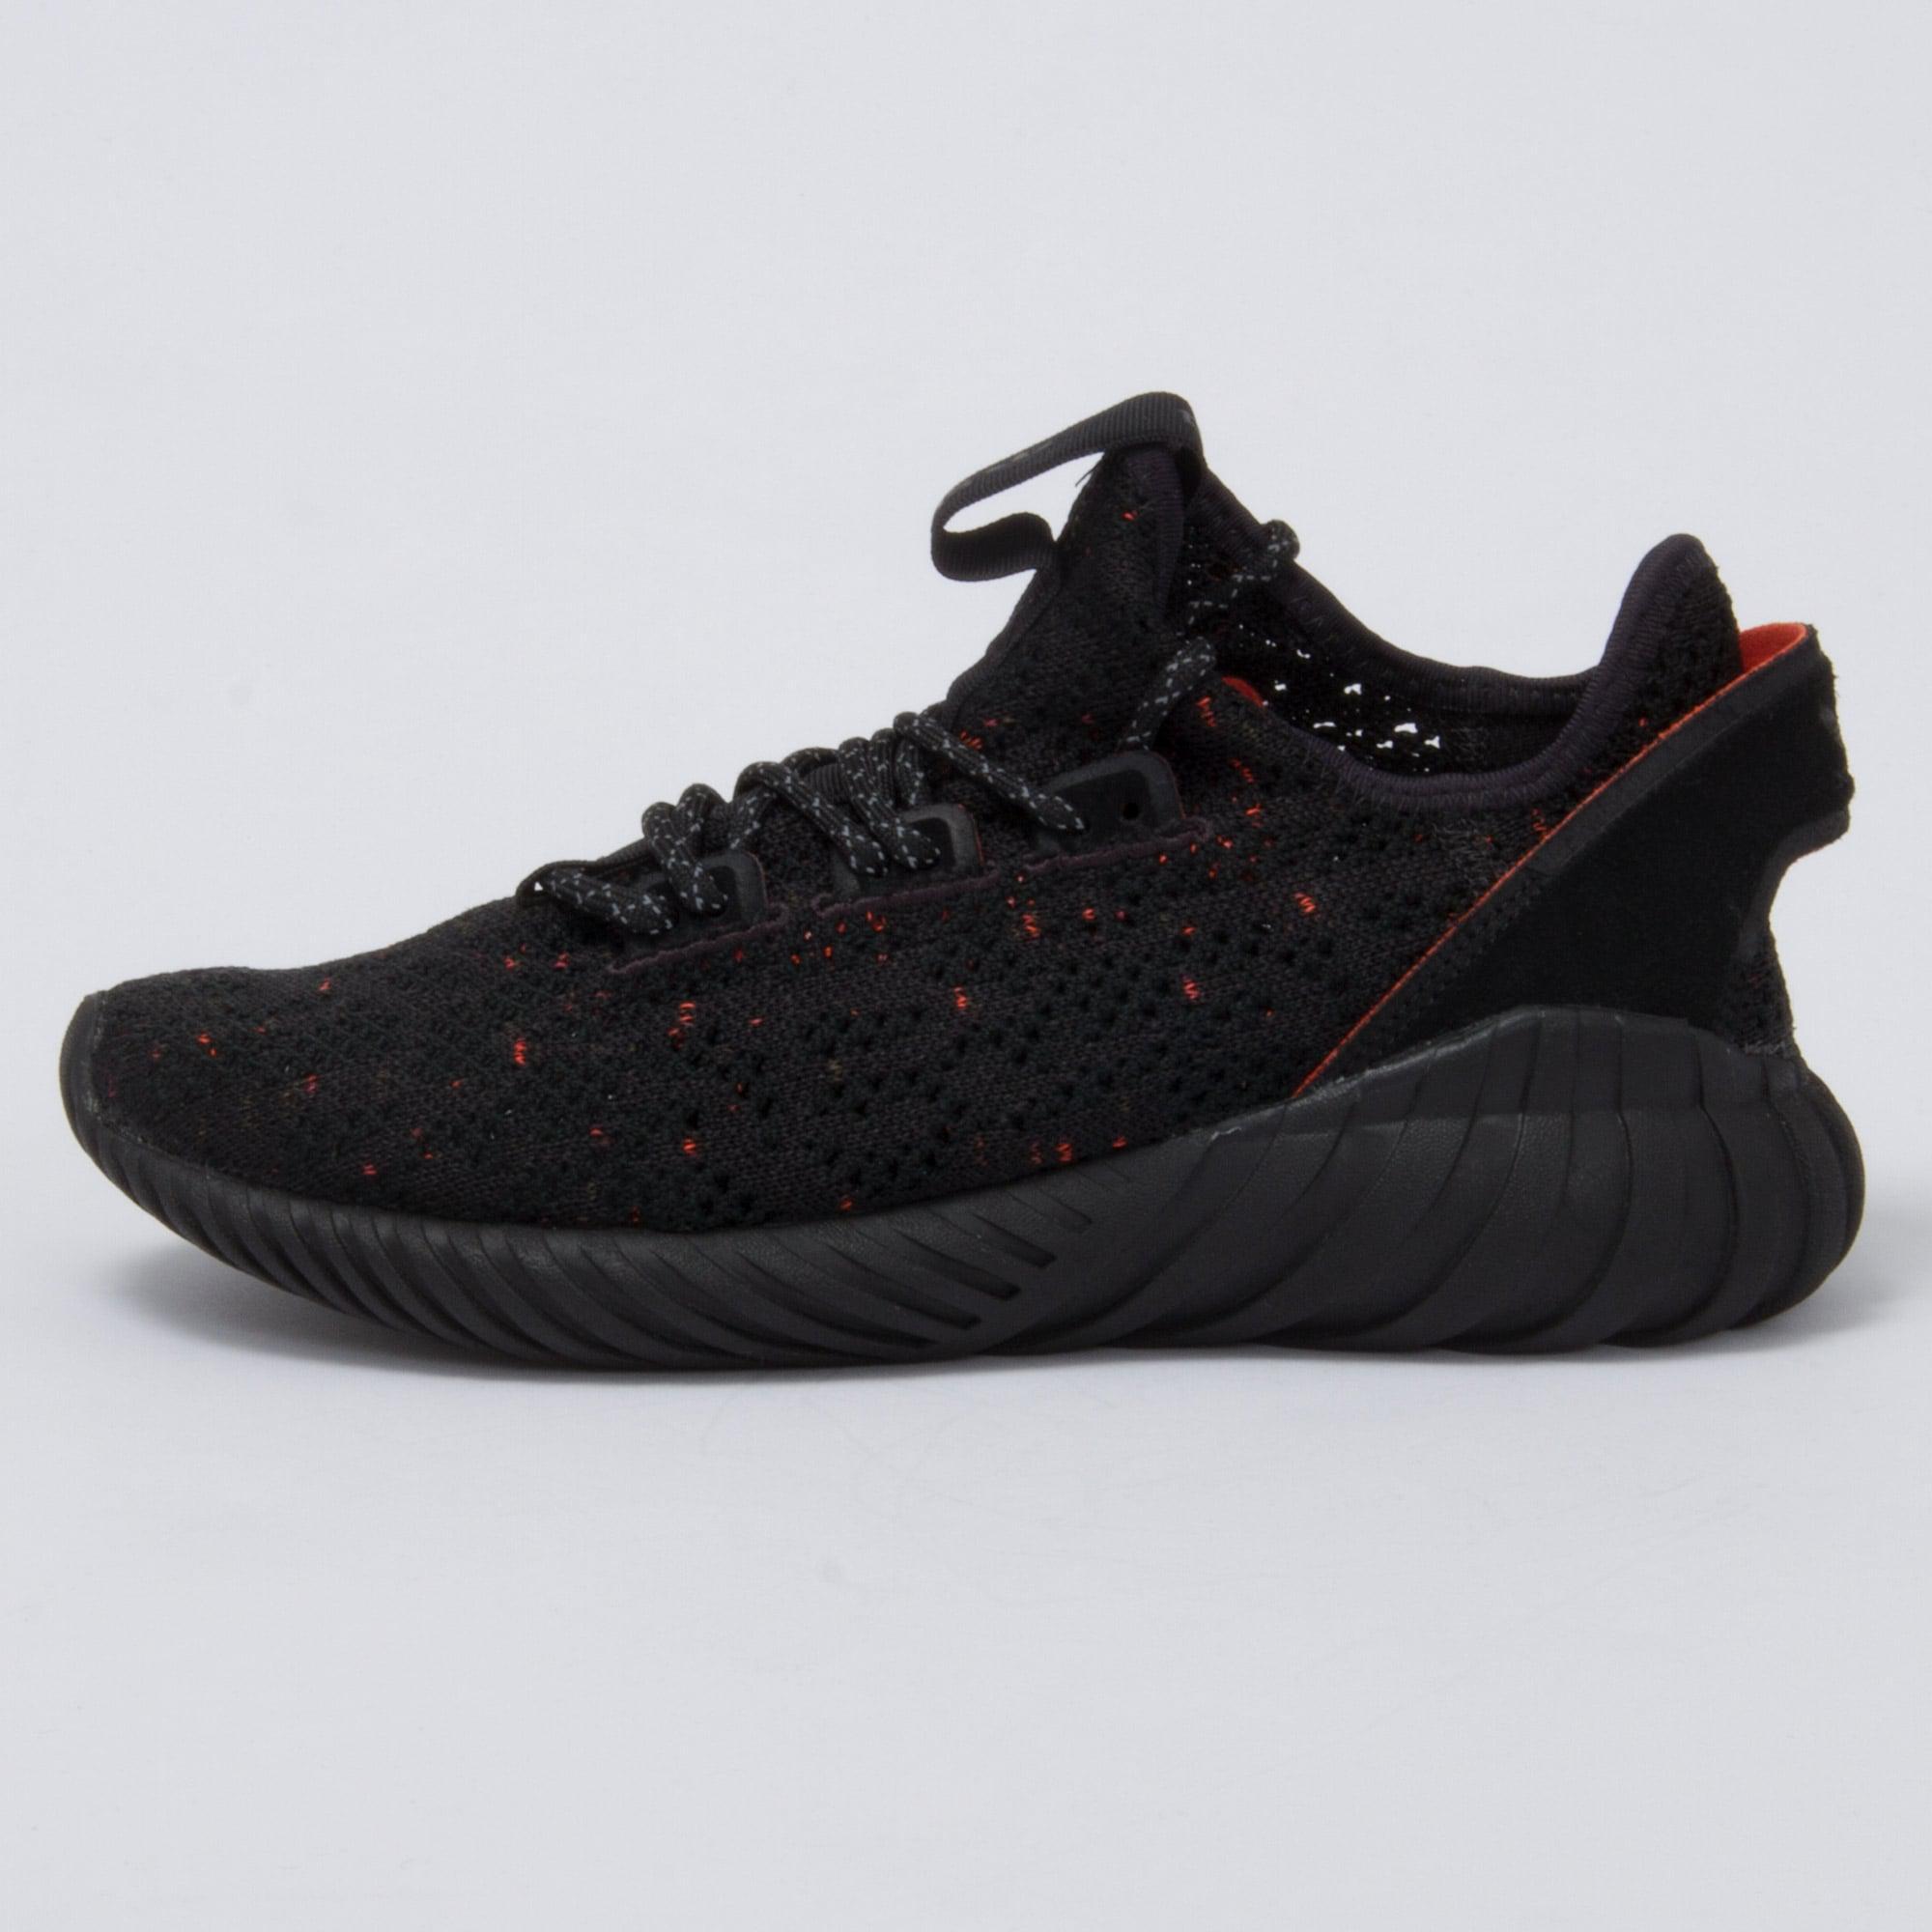 2821ff002d9b Lyst - adidas Originals Tubular Doom Sock Primeknit in Black for Men